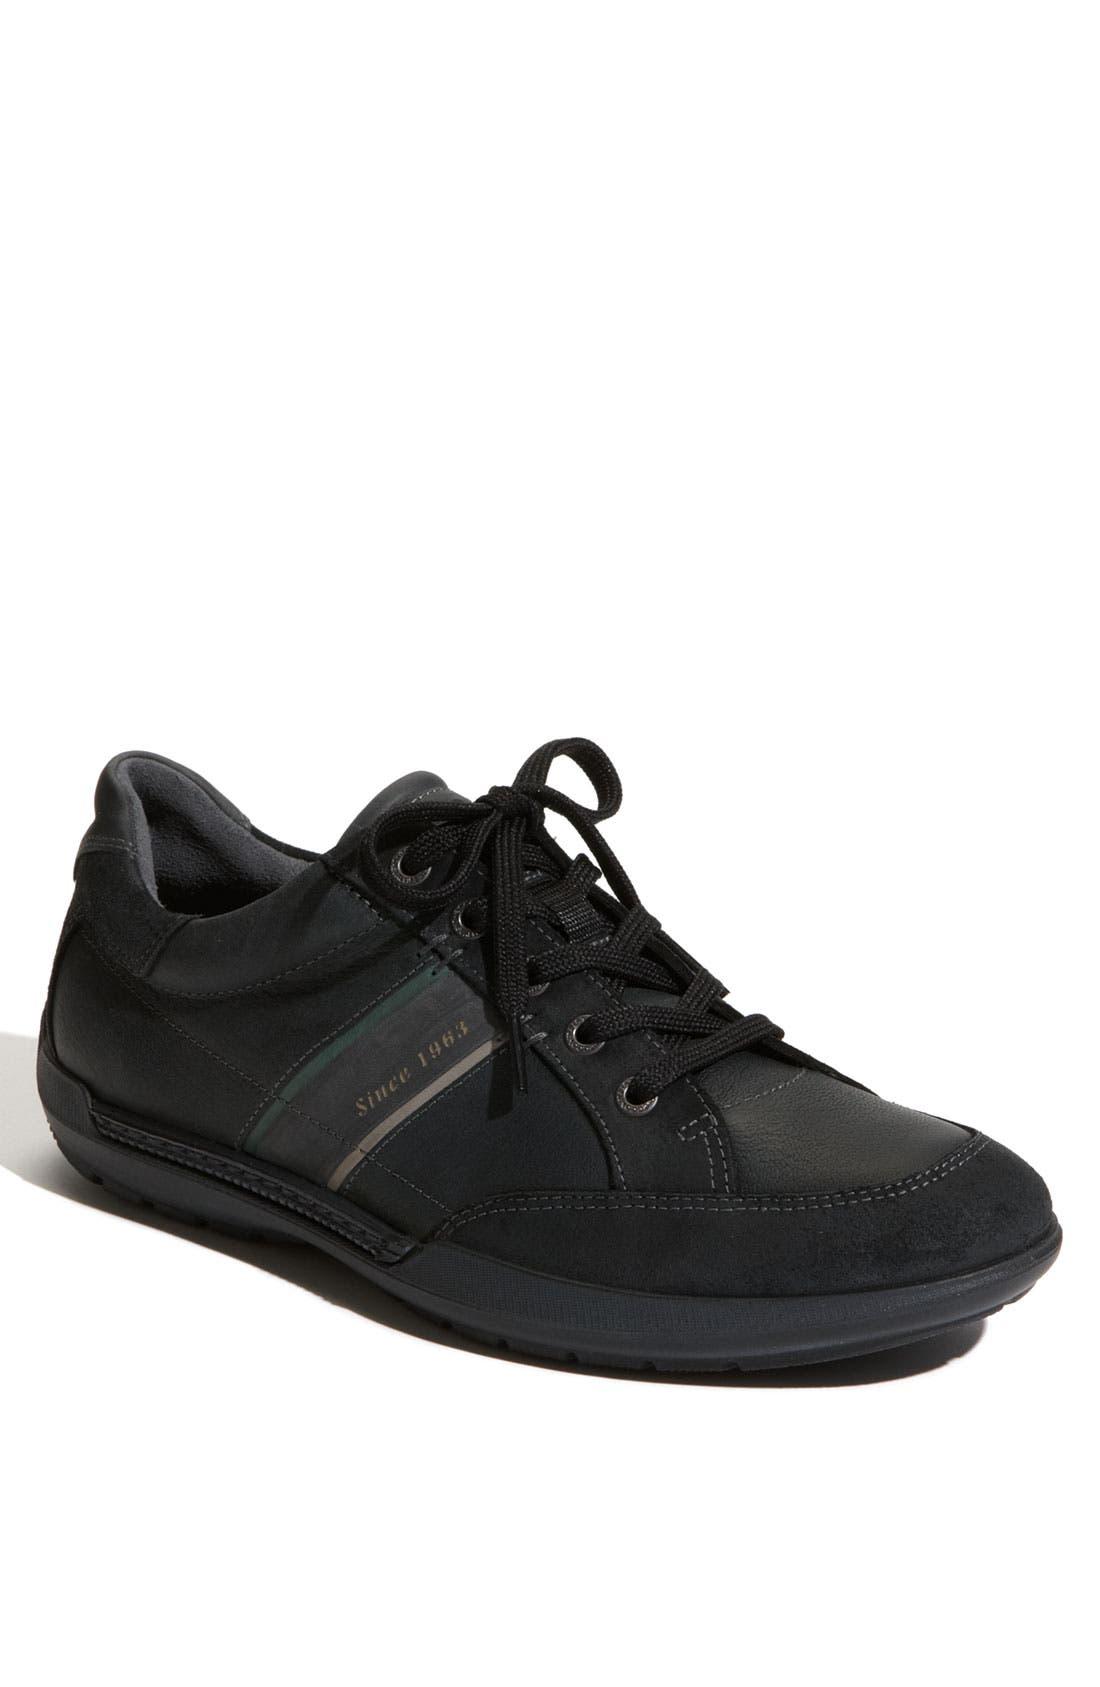 Alternate Image 1 Selected - ECCO 'Welt II' Sneaker